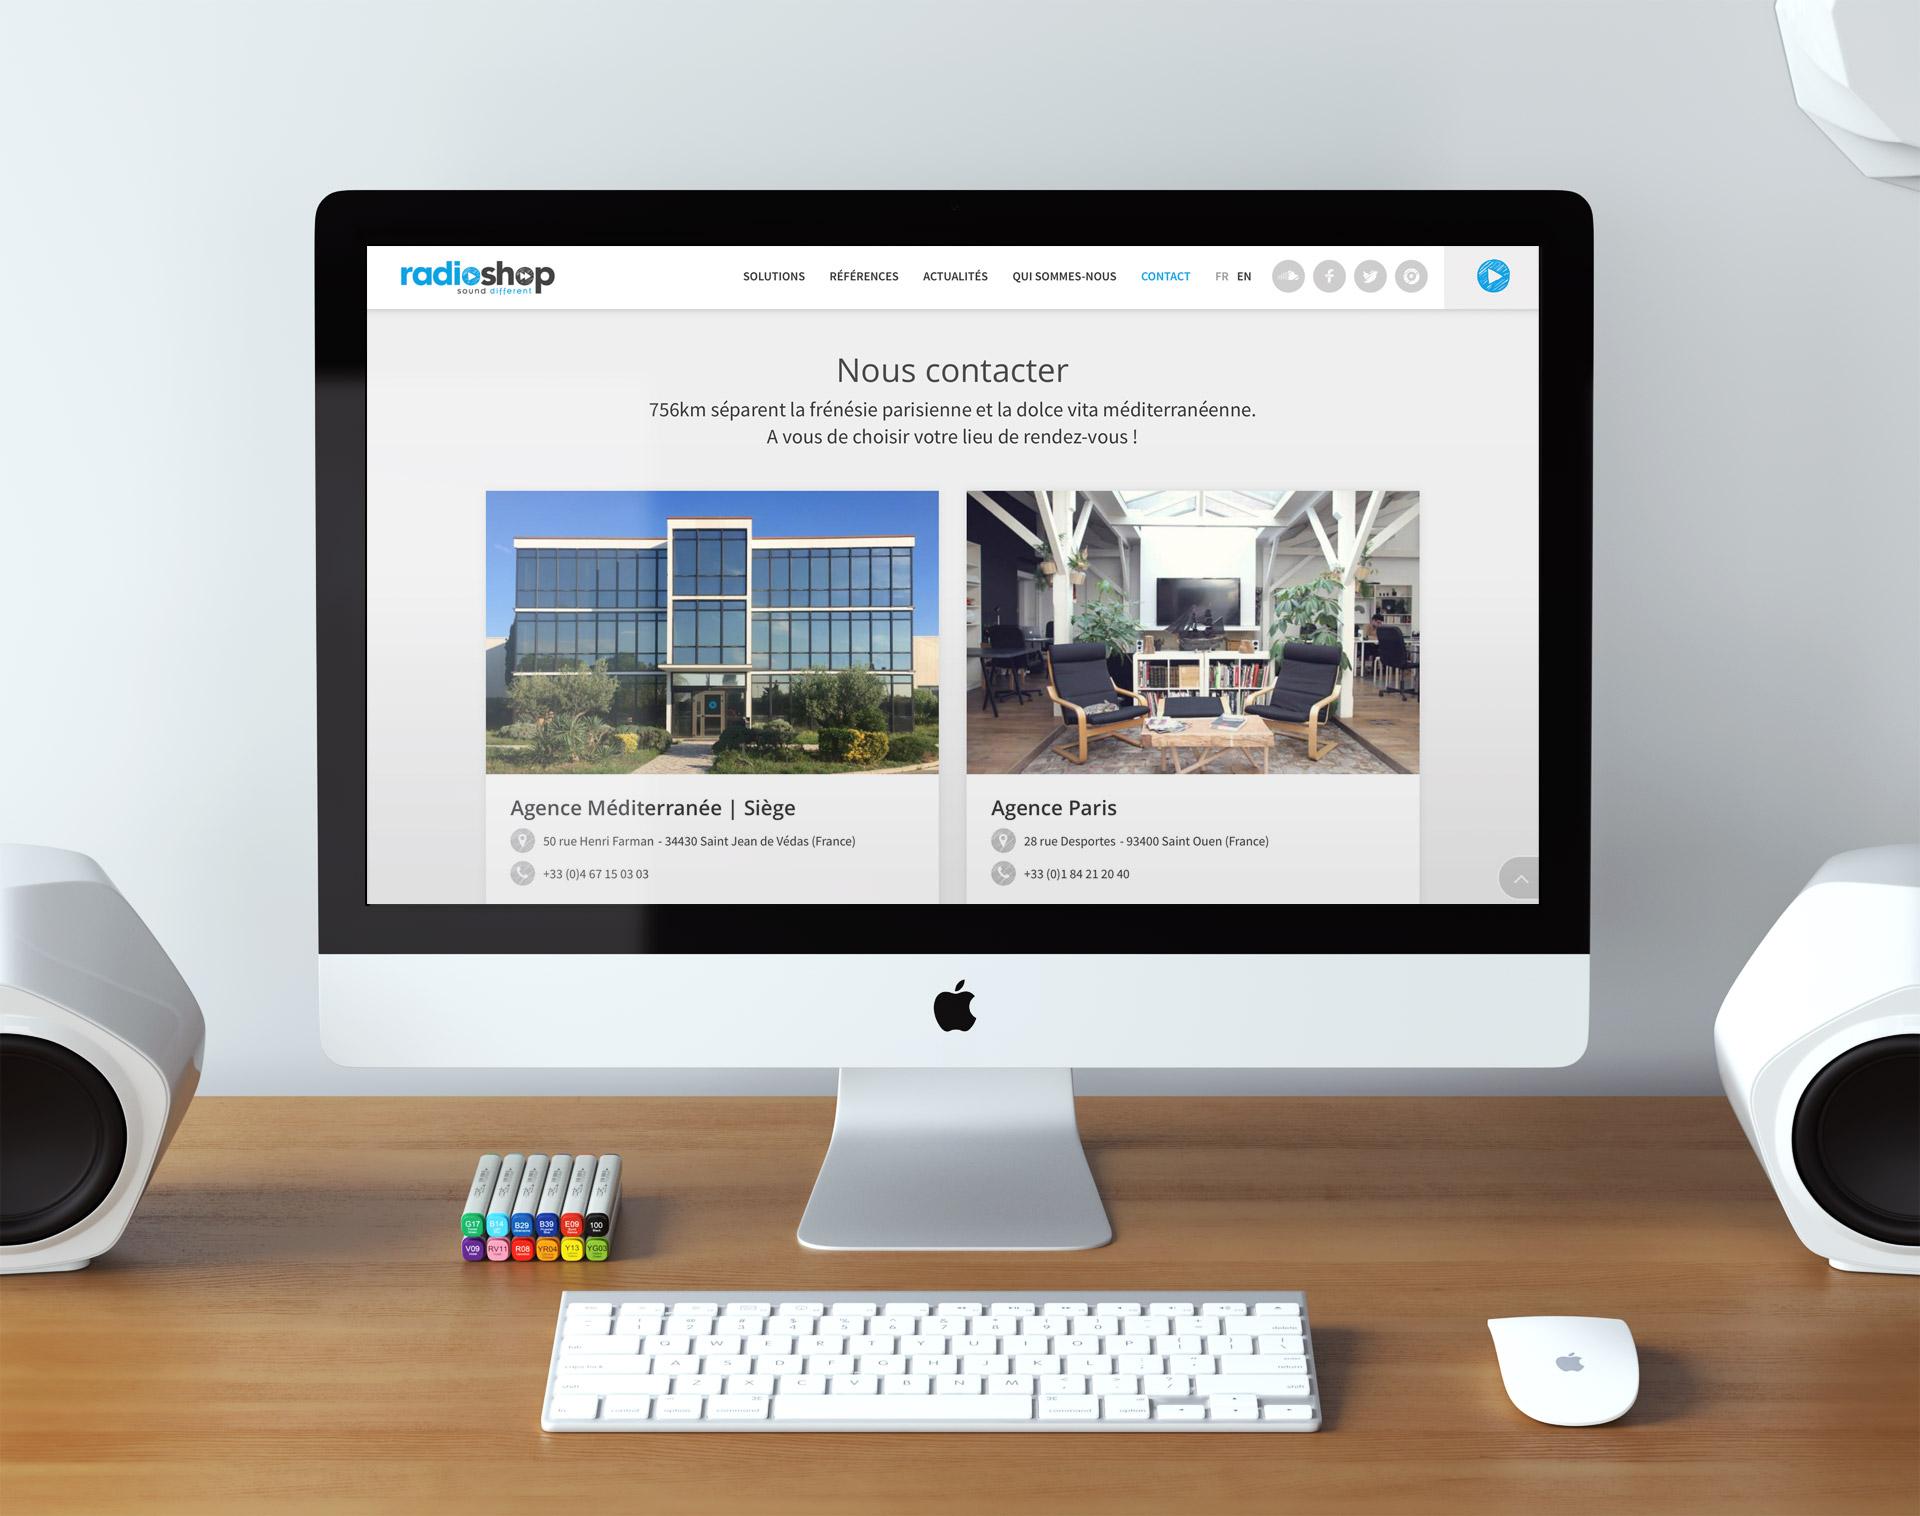 radioshop-creation-site-web-responsive-design-graphiste-montpellier-alexis-cretin-4